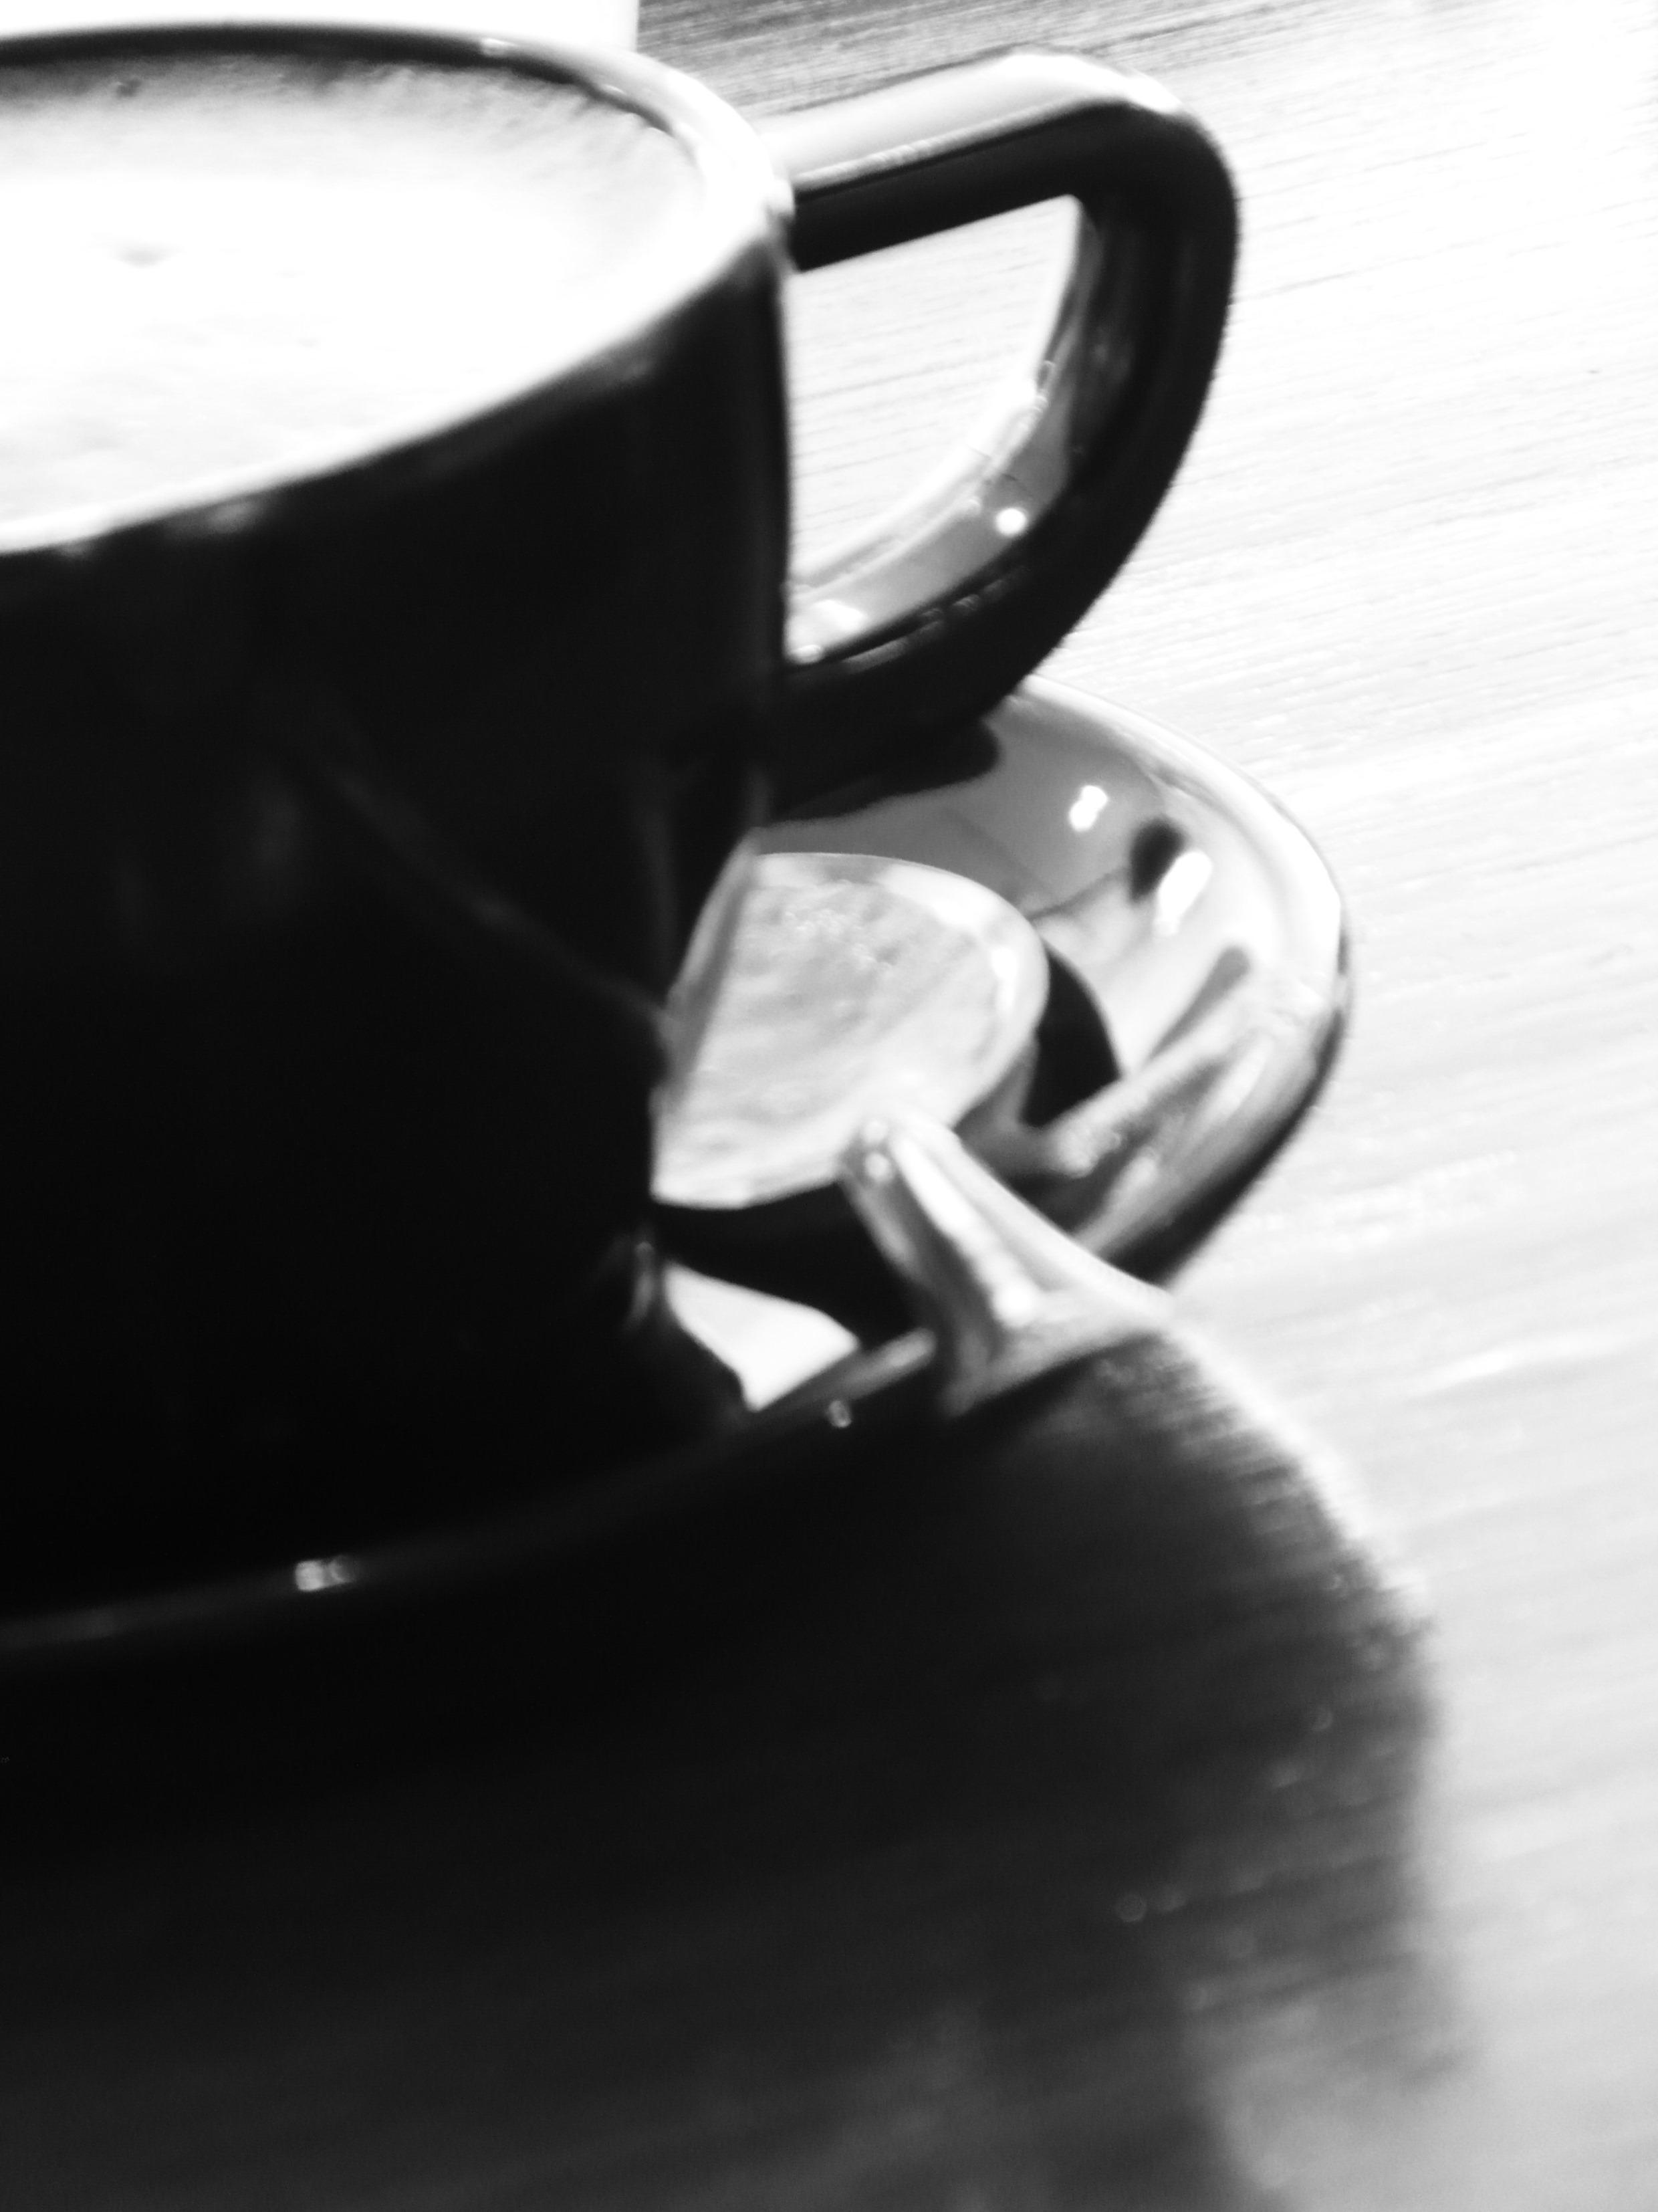 Black coffee cup b&w image photo